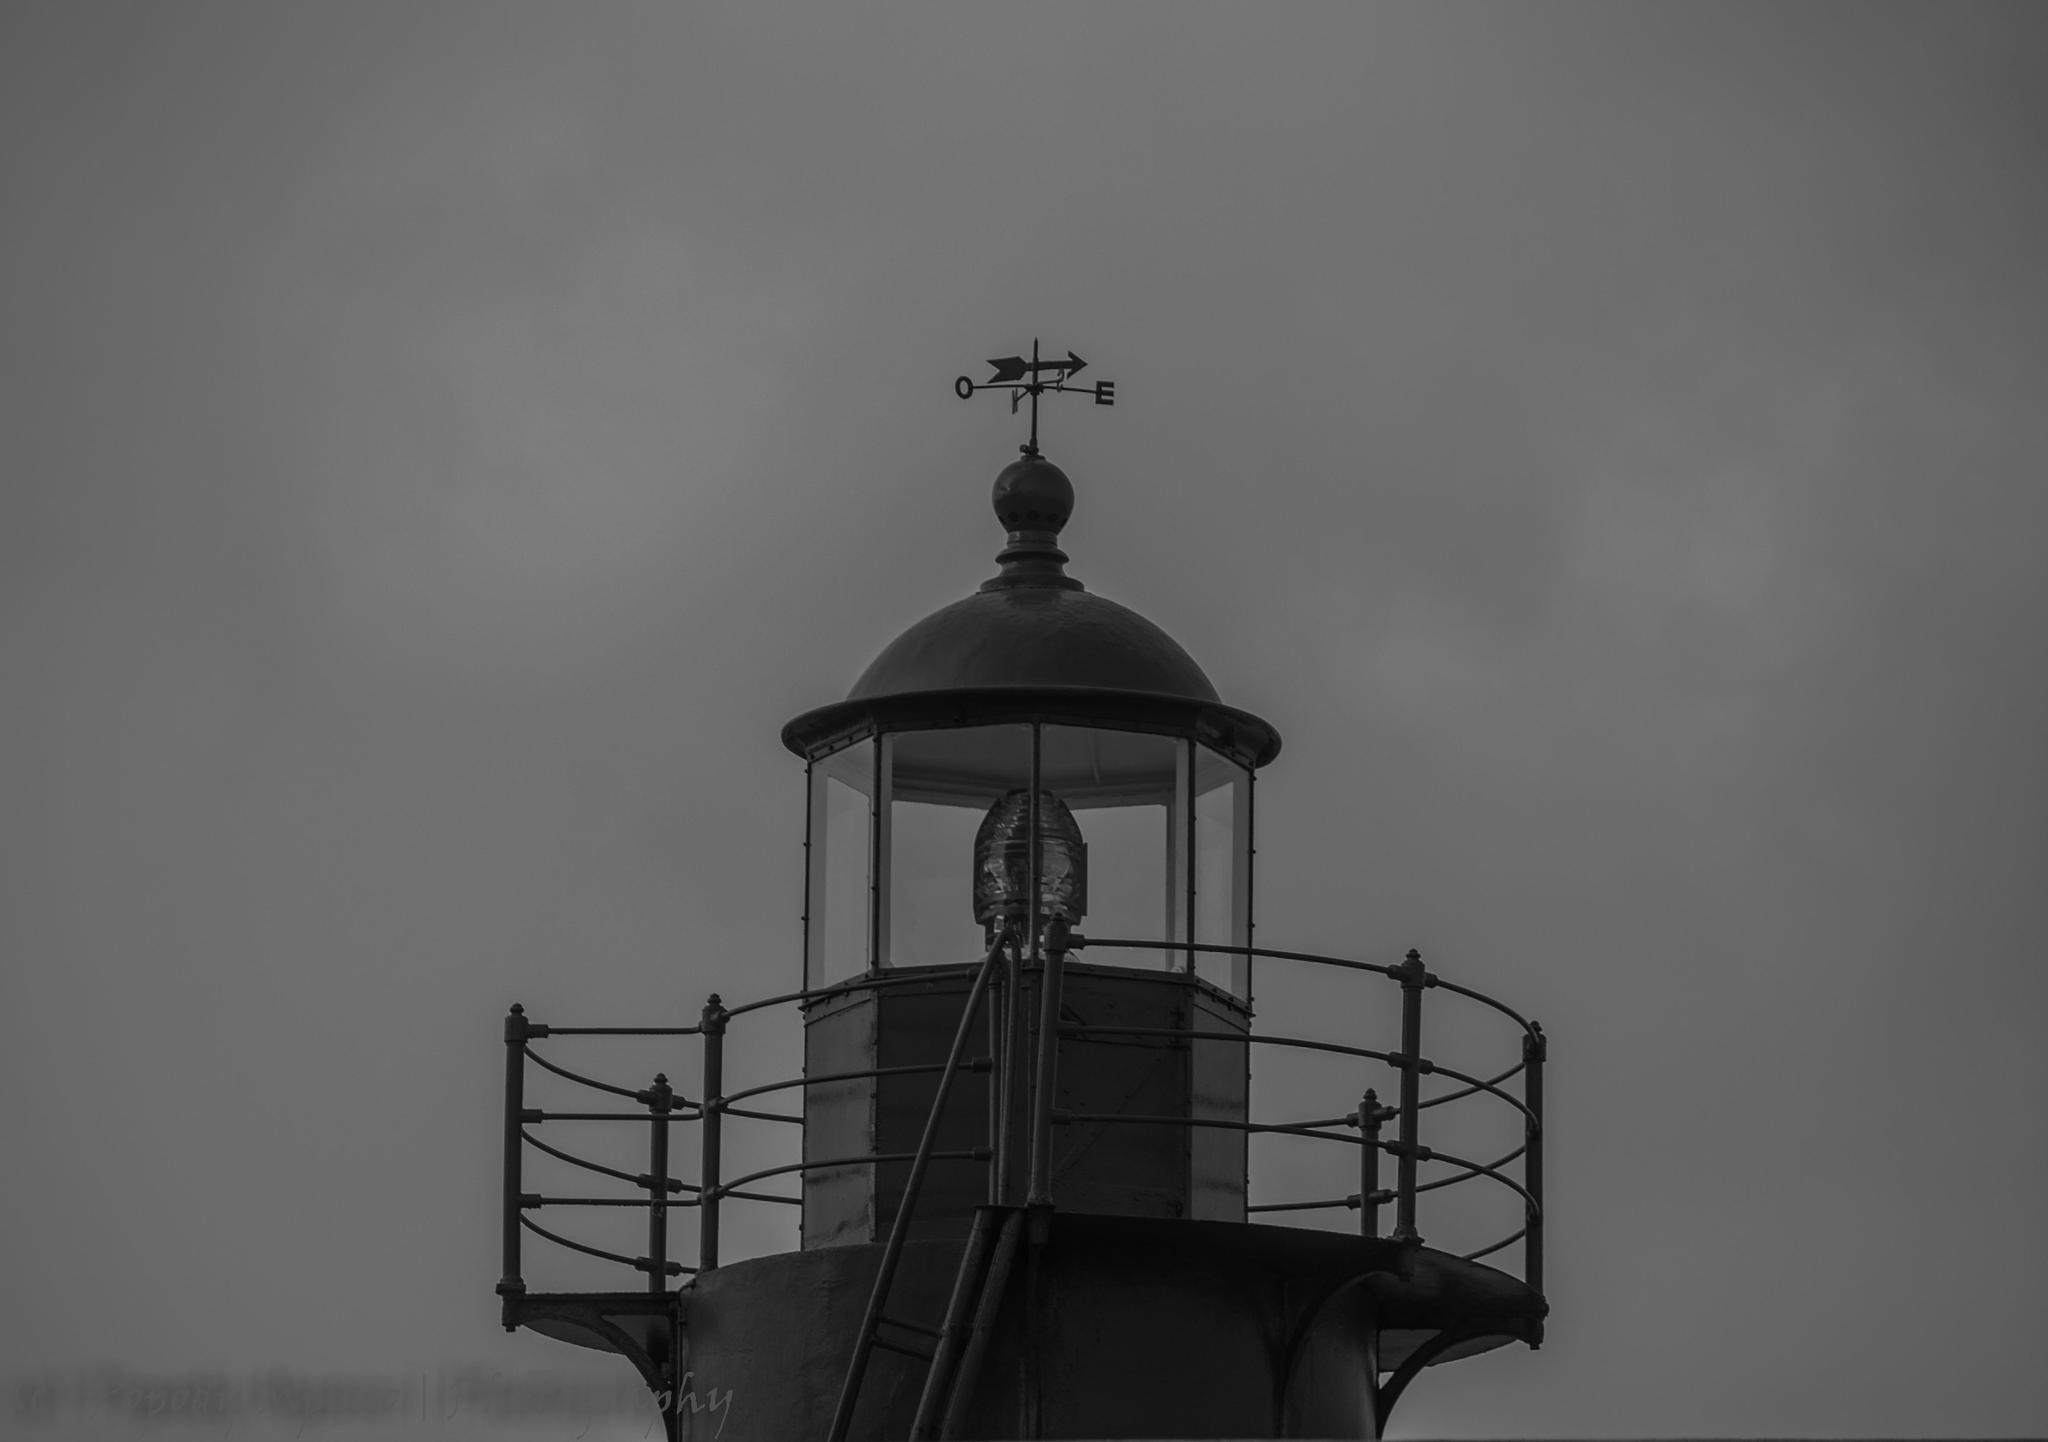 Lighthouse by Popody Mpouo